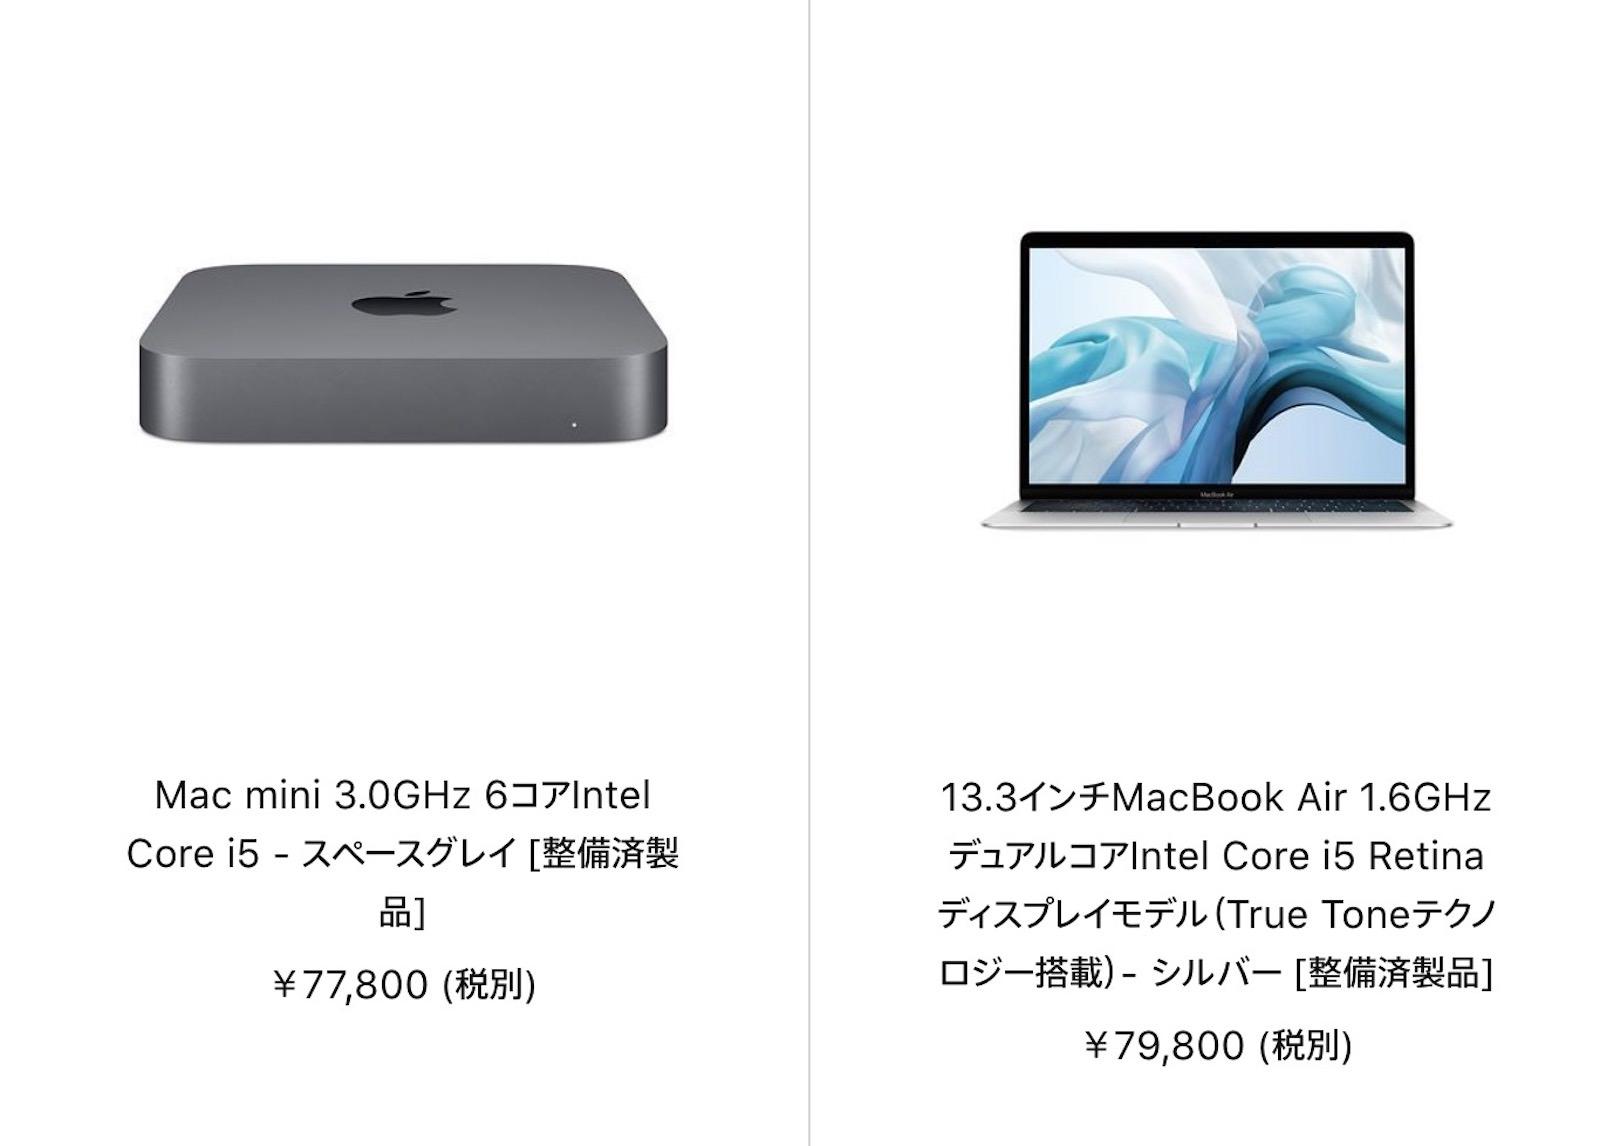 Mac mini and macbook air refuribished